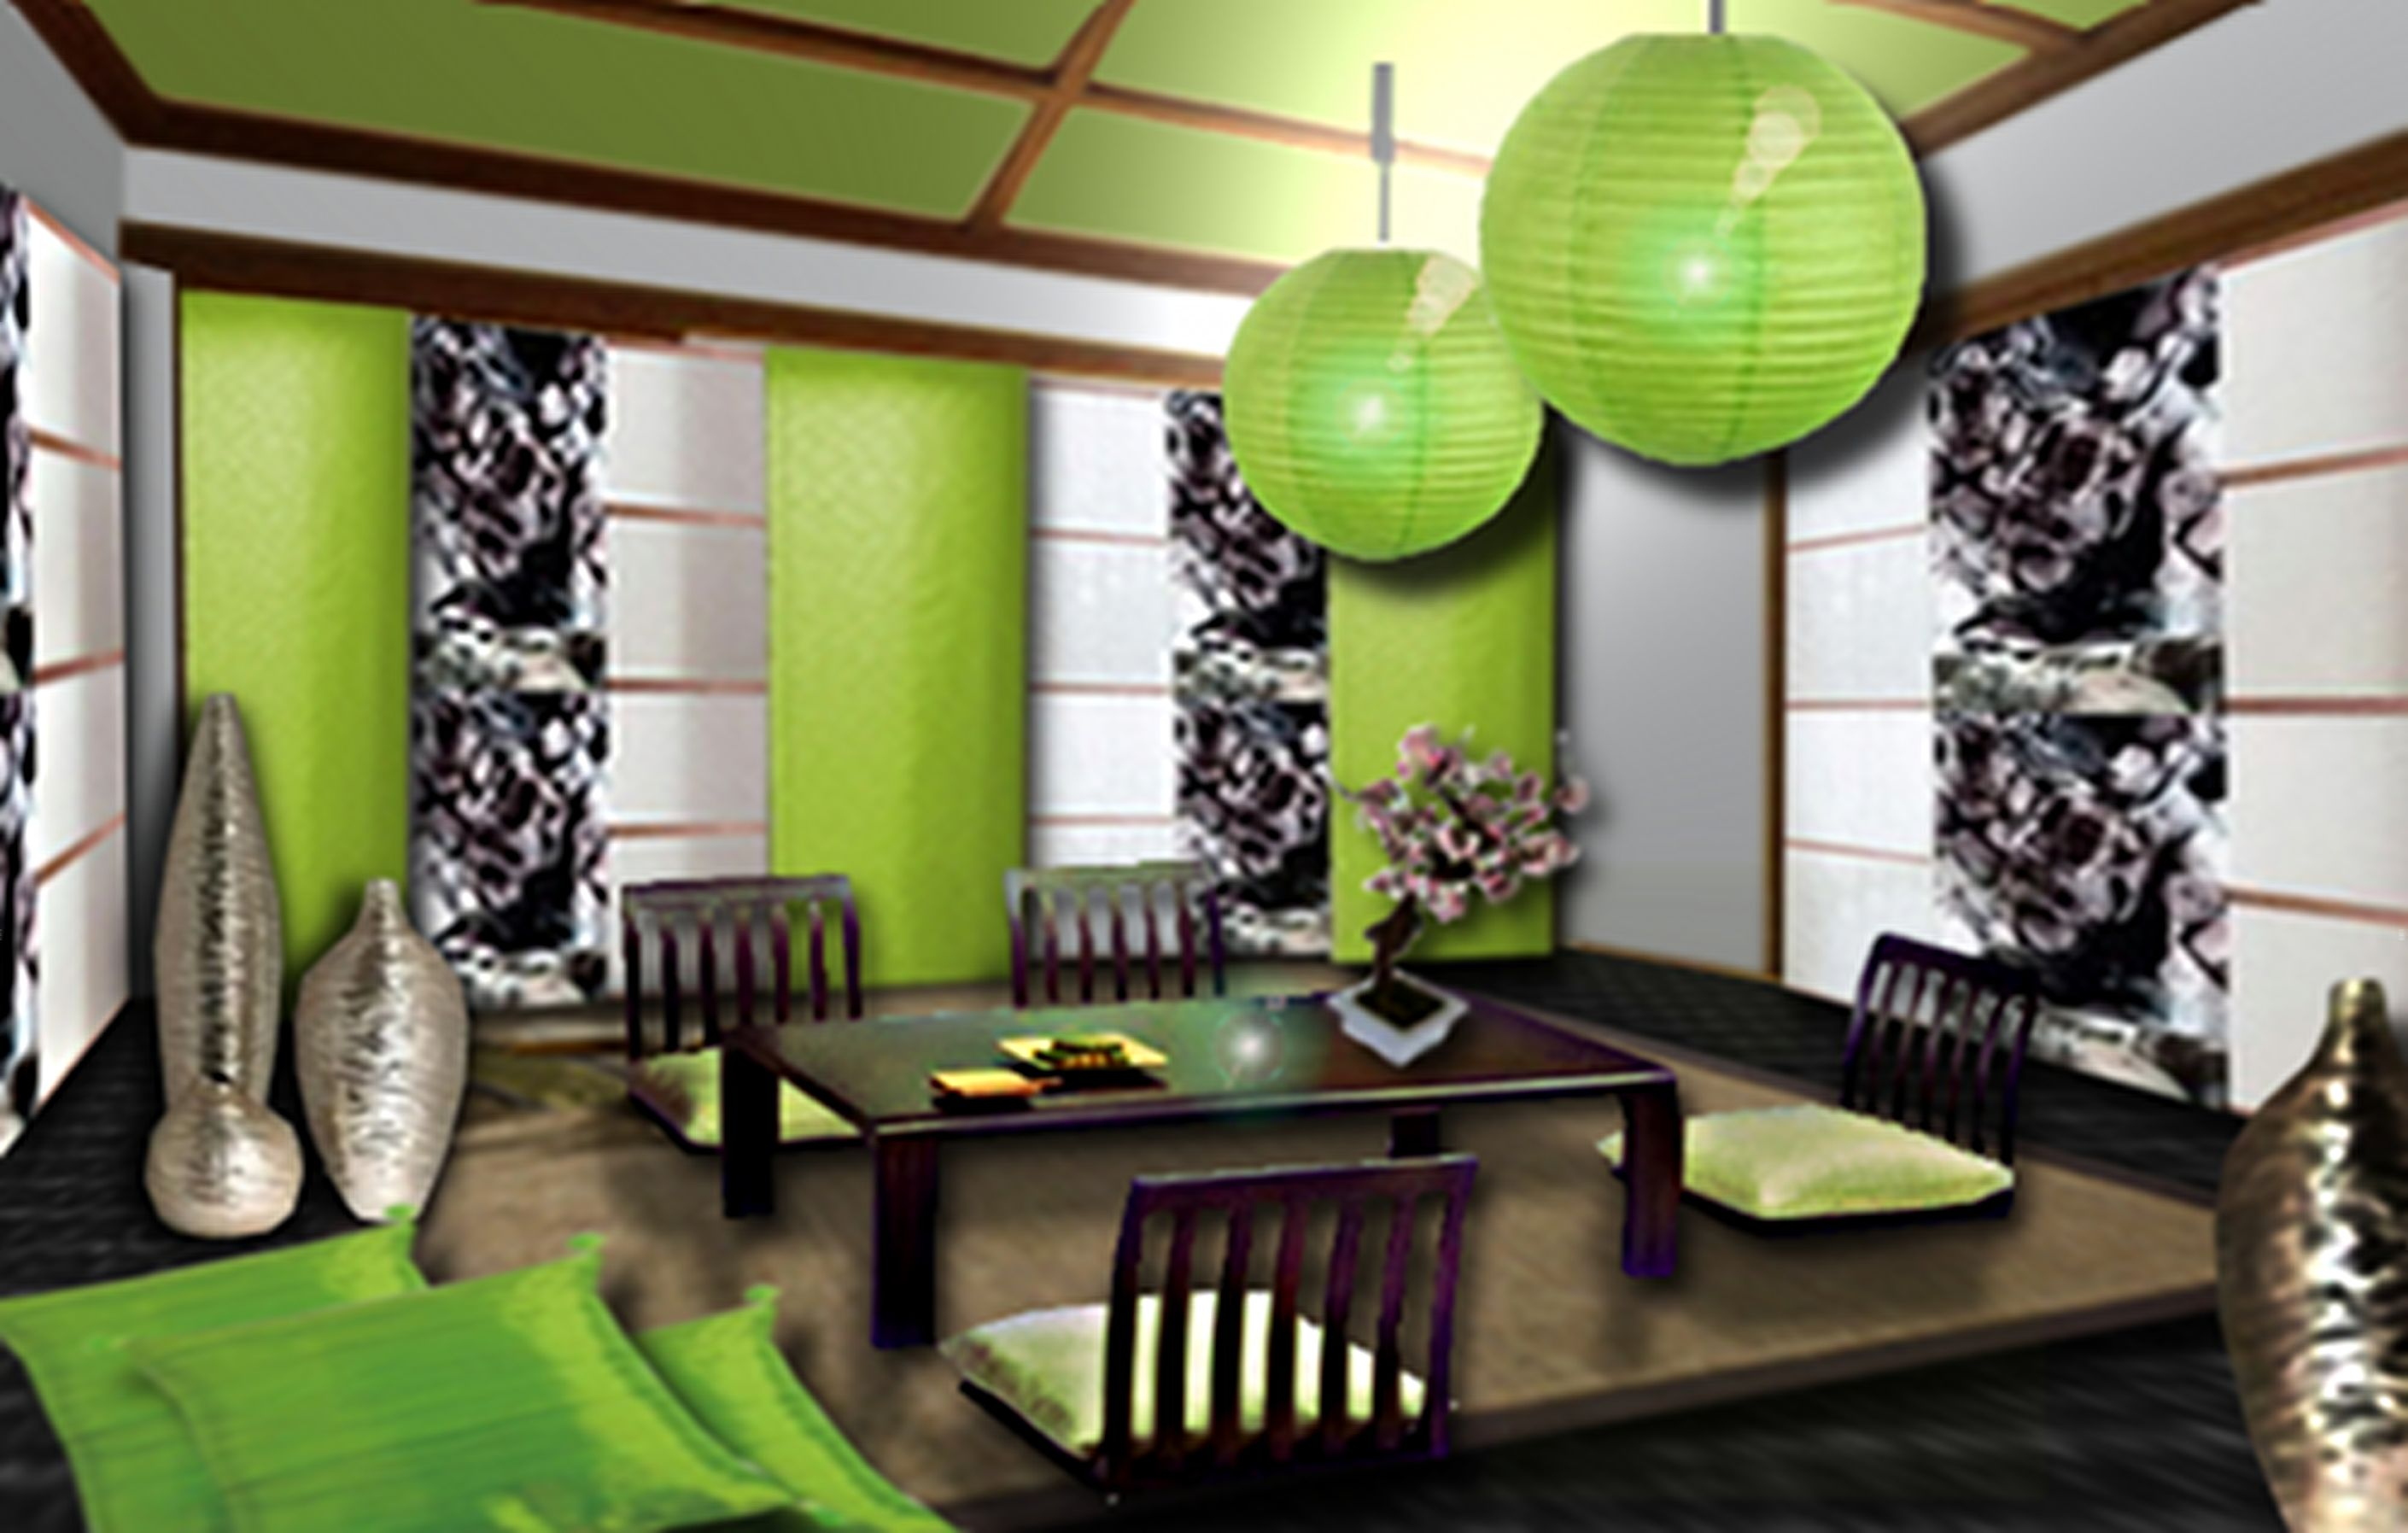 Decoration Salon Zen Photo japanese trendy decoration | decoration ideas | decor, green